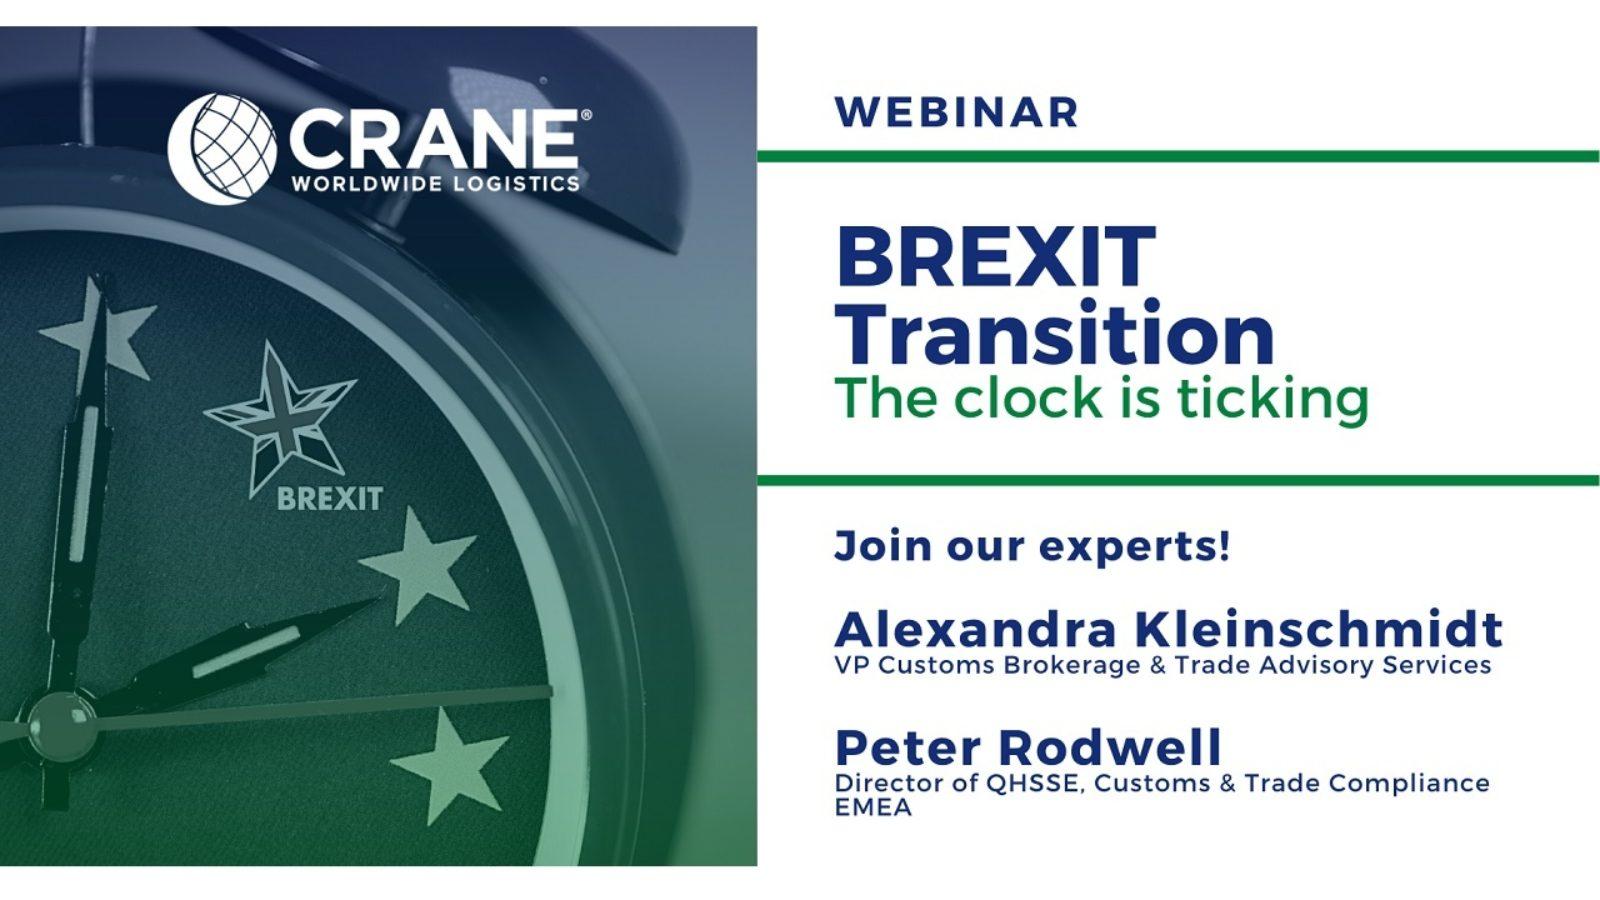 Crane Worldwide Logistics host Brexit webinar